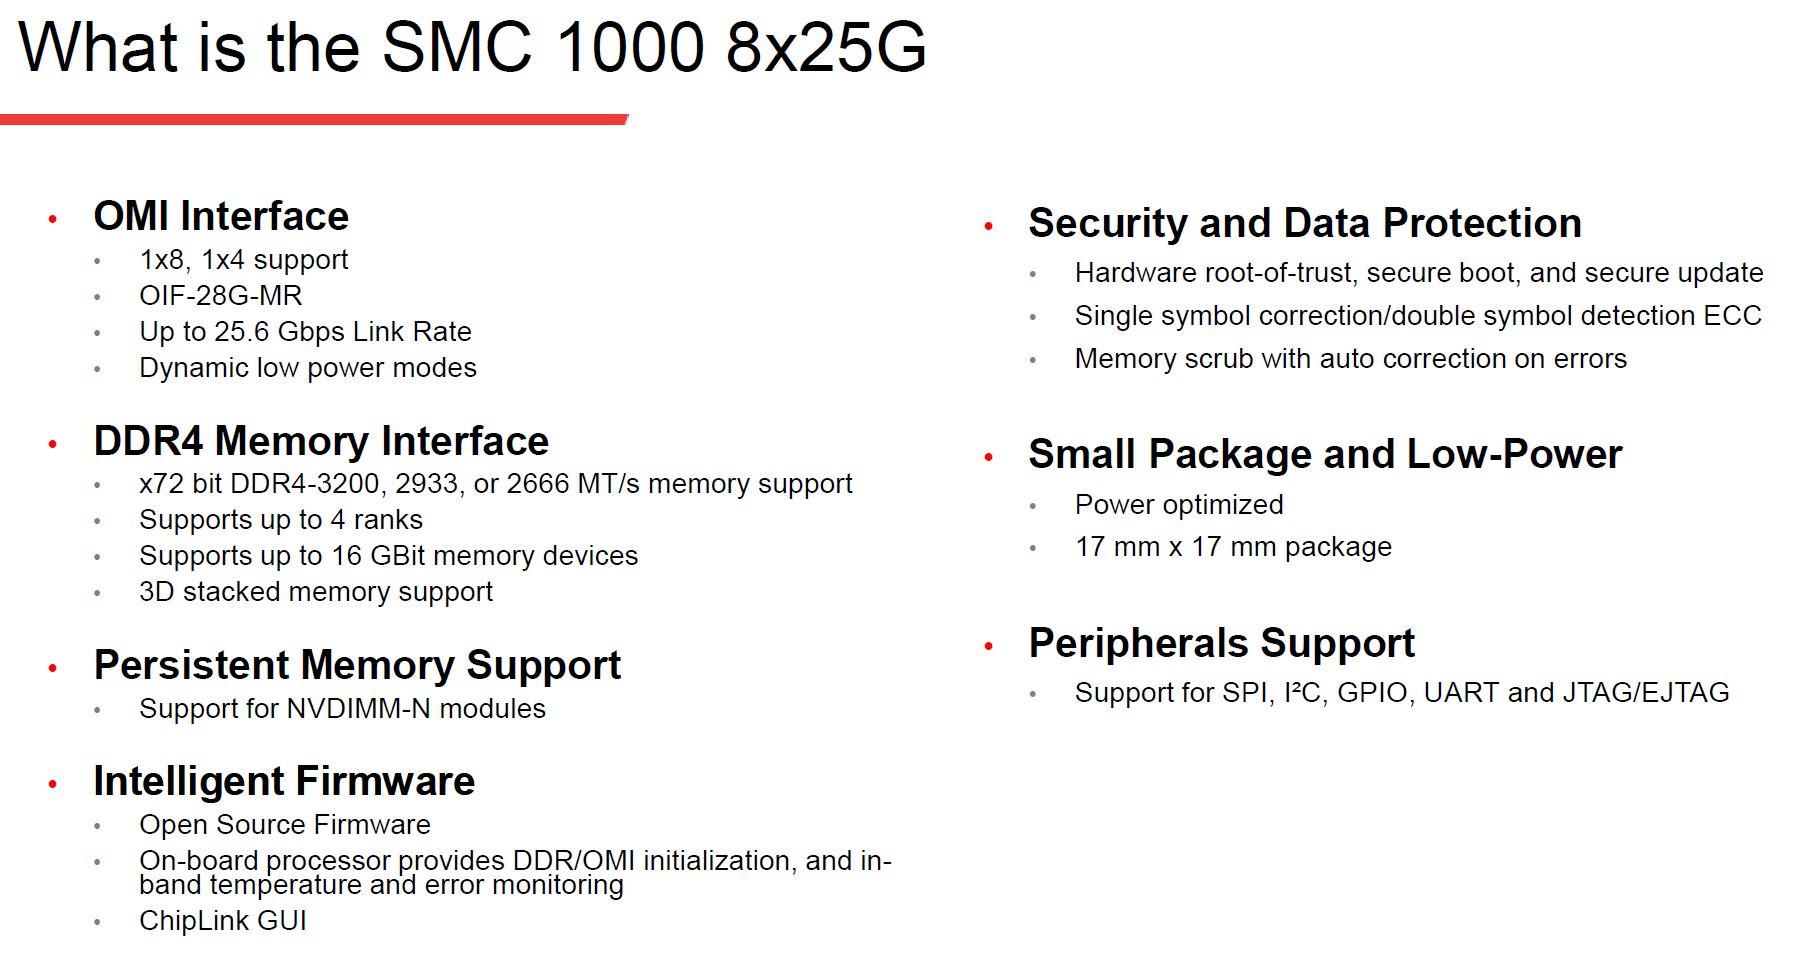 Microchip SMC 1000 8x25G Specs